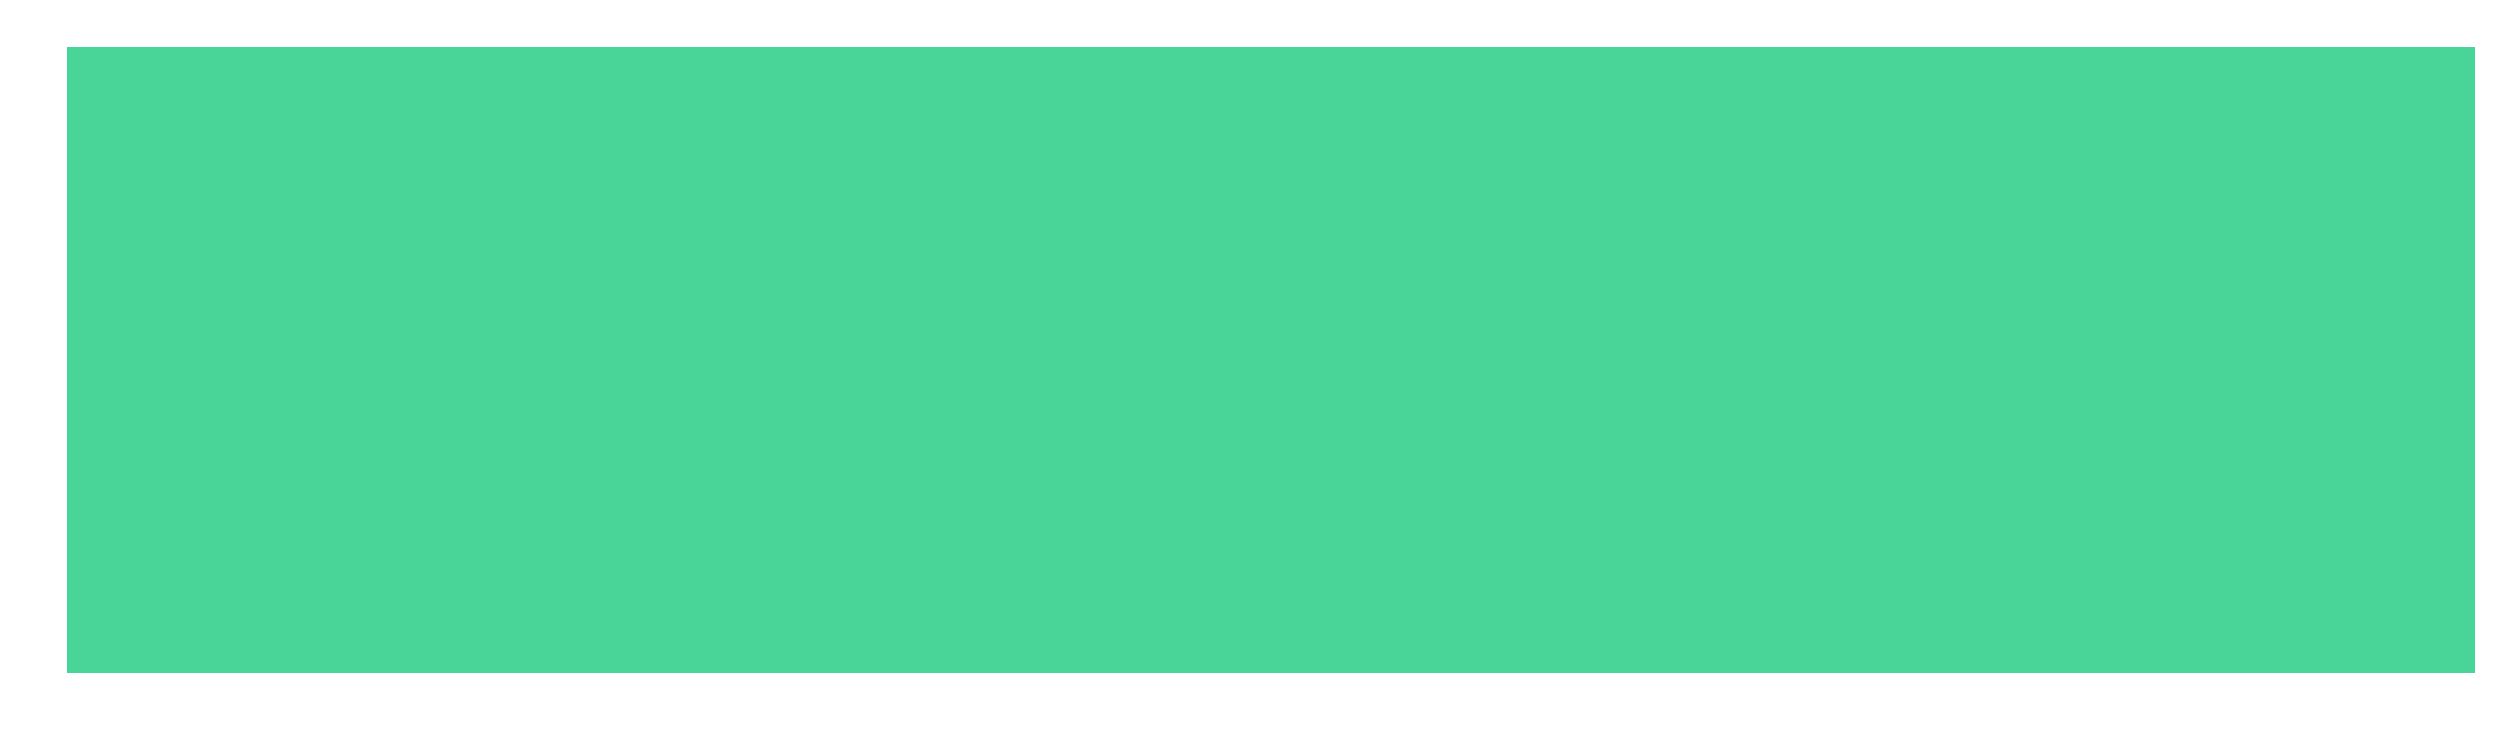 STB Intercâmbio